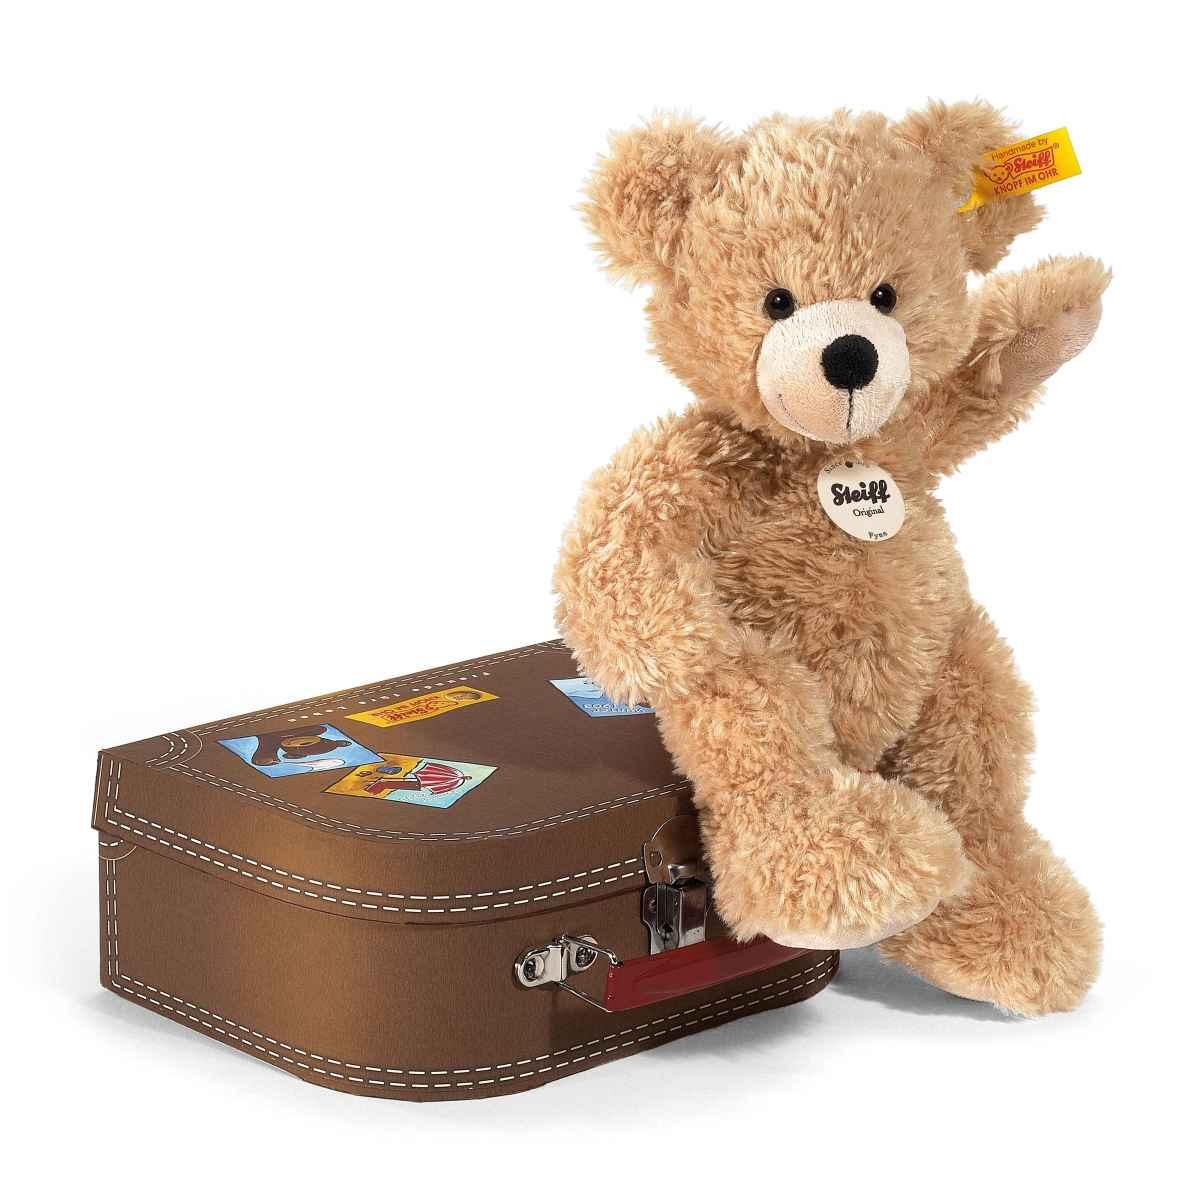 Fynn Teddy bear in suitcase